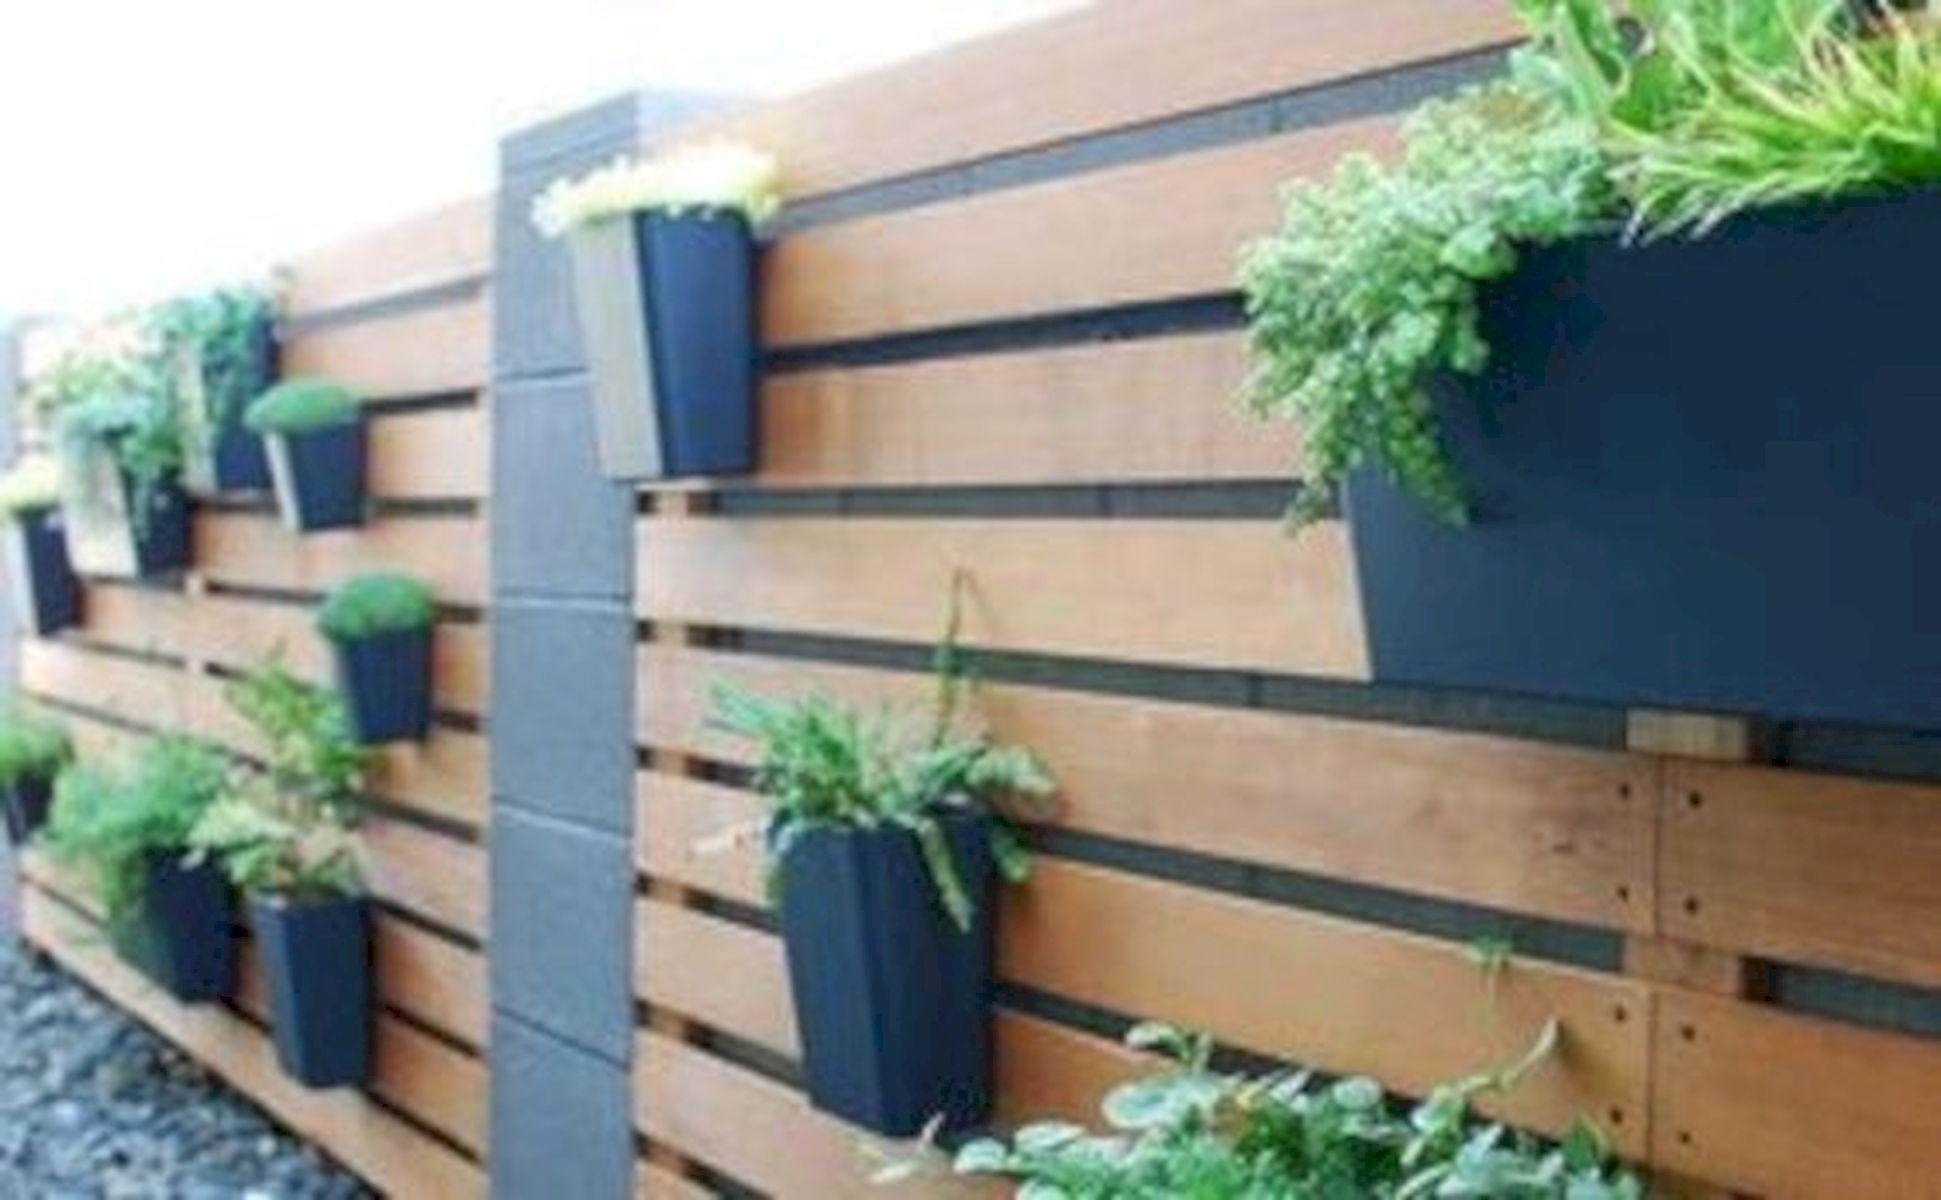 50 Awesome DIY Hanging Plants Ideas For Modern Backyard Garden (22)